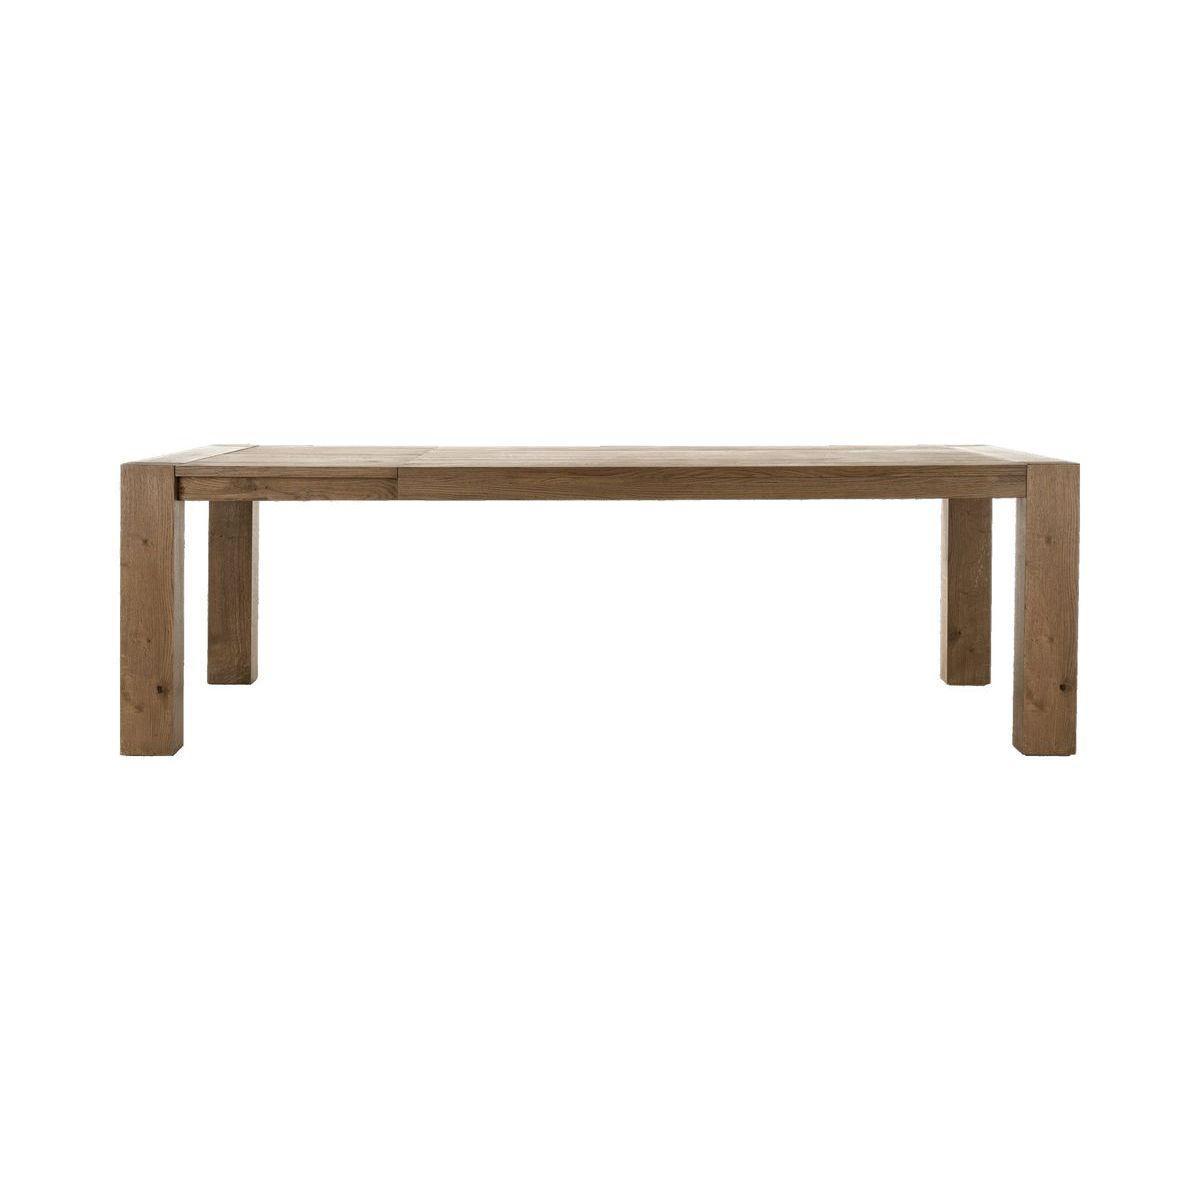 Table à rallonge 190-250cm SANTORINI Henders & Hazel castle sand